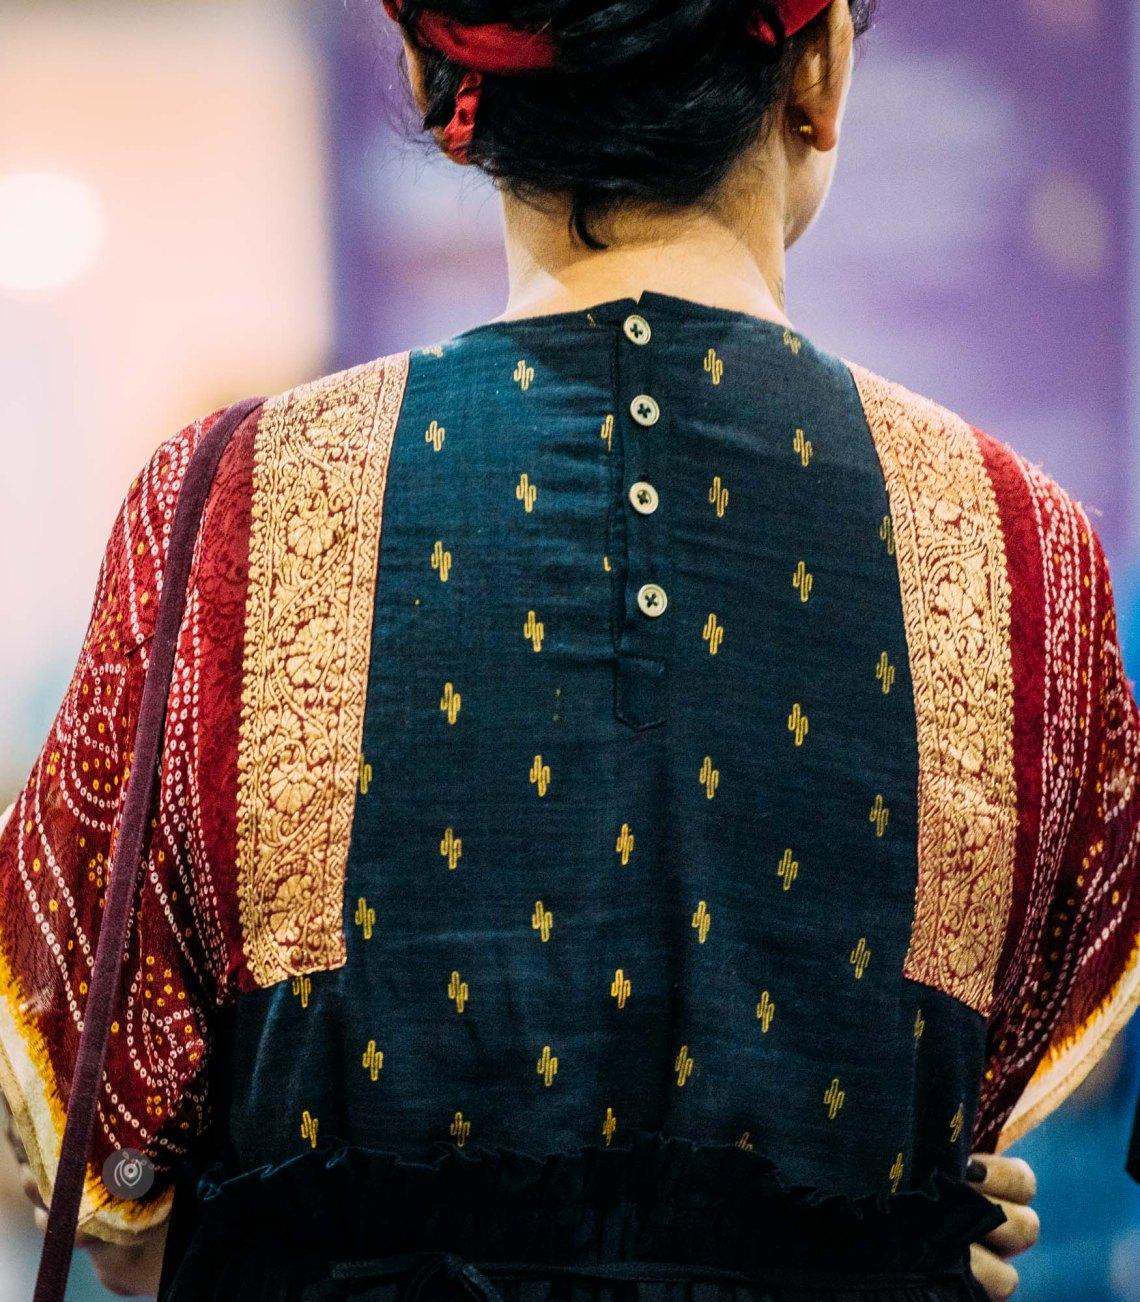 Naina.co, Visual Storyteller, Luxury Brands, Naina Redhu, Professional Photographer, Experience Collector, Luxury Photographer, Luxury Blogger, Lifestyle, Visual Storyteller for Luxury Brands, EyesForLuxury, Luxury Blogger, Lifestyle Blogger, Luxury Photographer India, Lifestyle Photographer India, Luxury Blogger India, Lifestyle Blogger India, #EyesForFashion, Vajor, Vajor.com, #AIFWSS17, Amazon India Fashion Week, Spring Summer, #CoverUp, CoverUp 87, Day One, India Fashion Week, Amazon Fashion Week, Tencel Denim Skirt, Ikat Shirt, Bag, Shoes, White Sneakers, Sunglasses, Kiko Milano, Makeup, Kiko Milano India